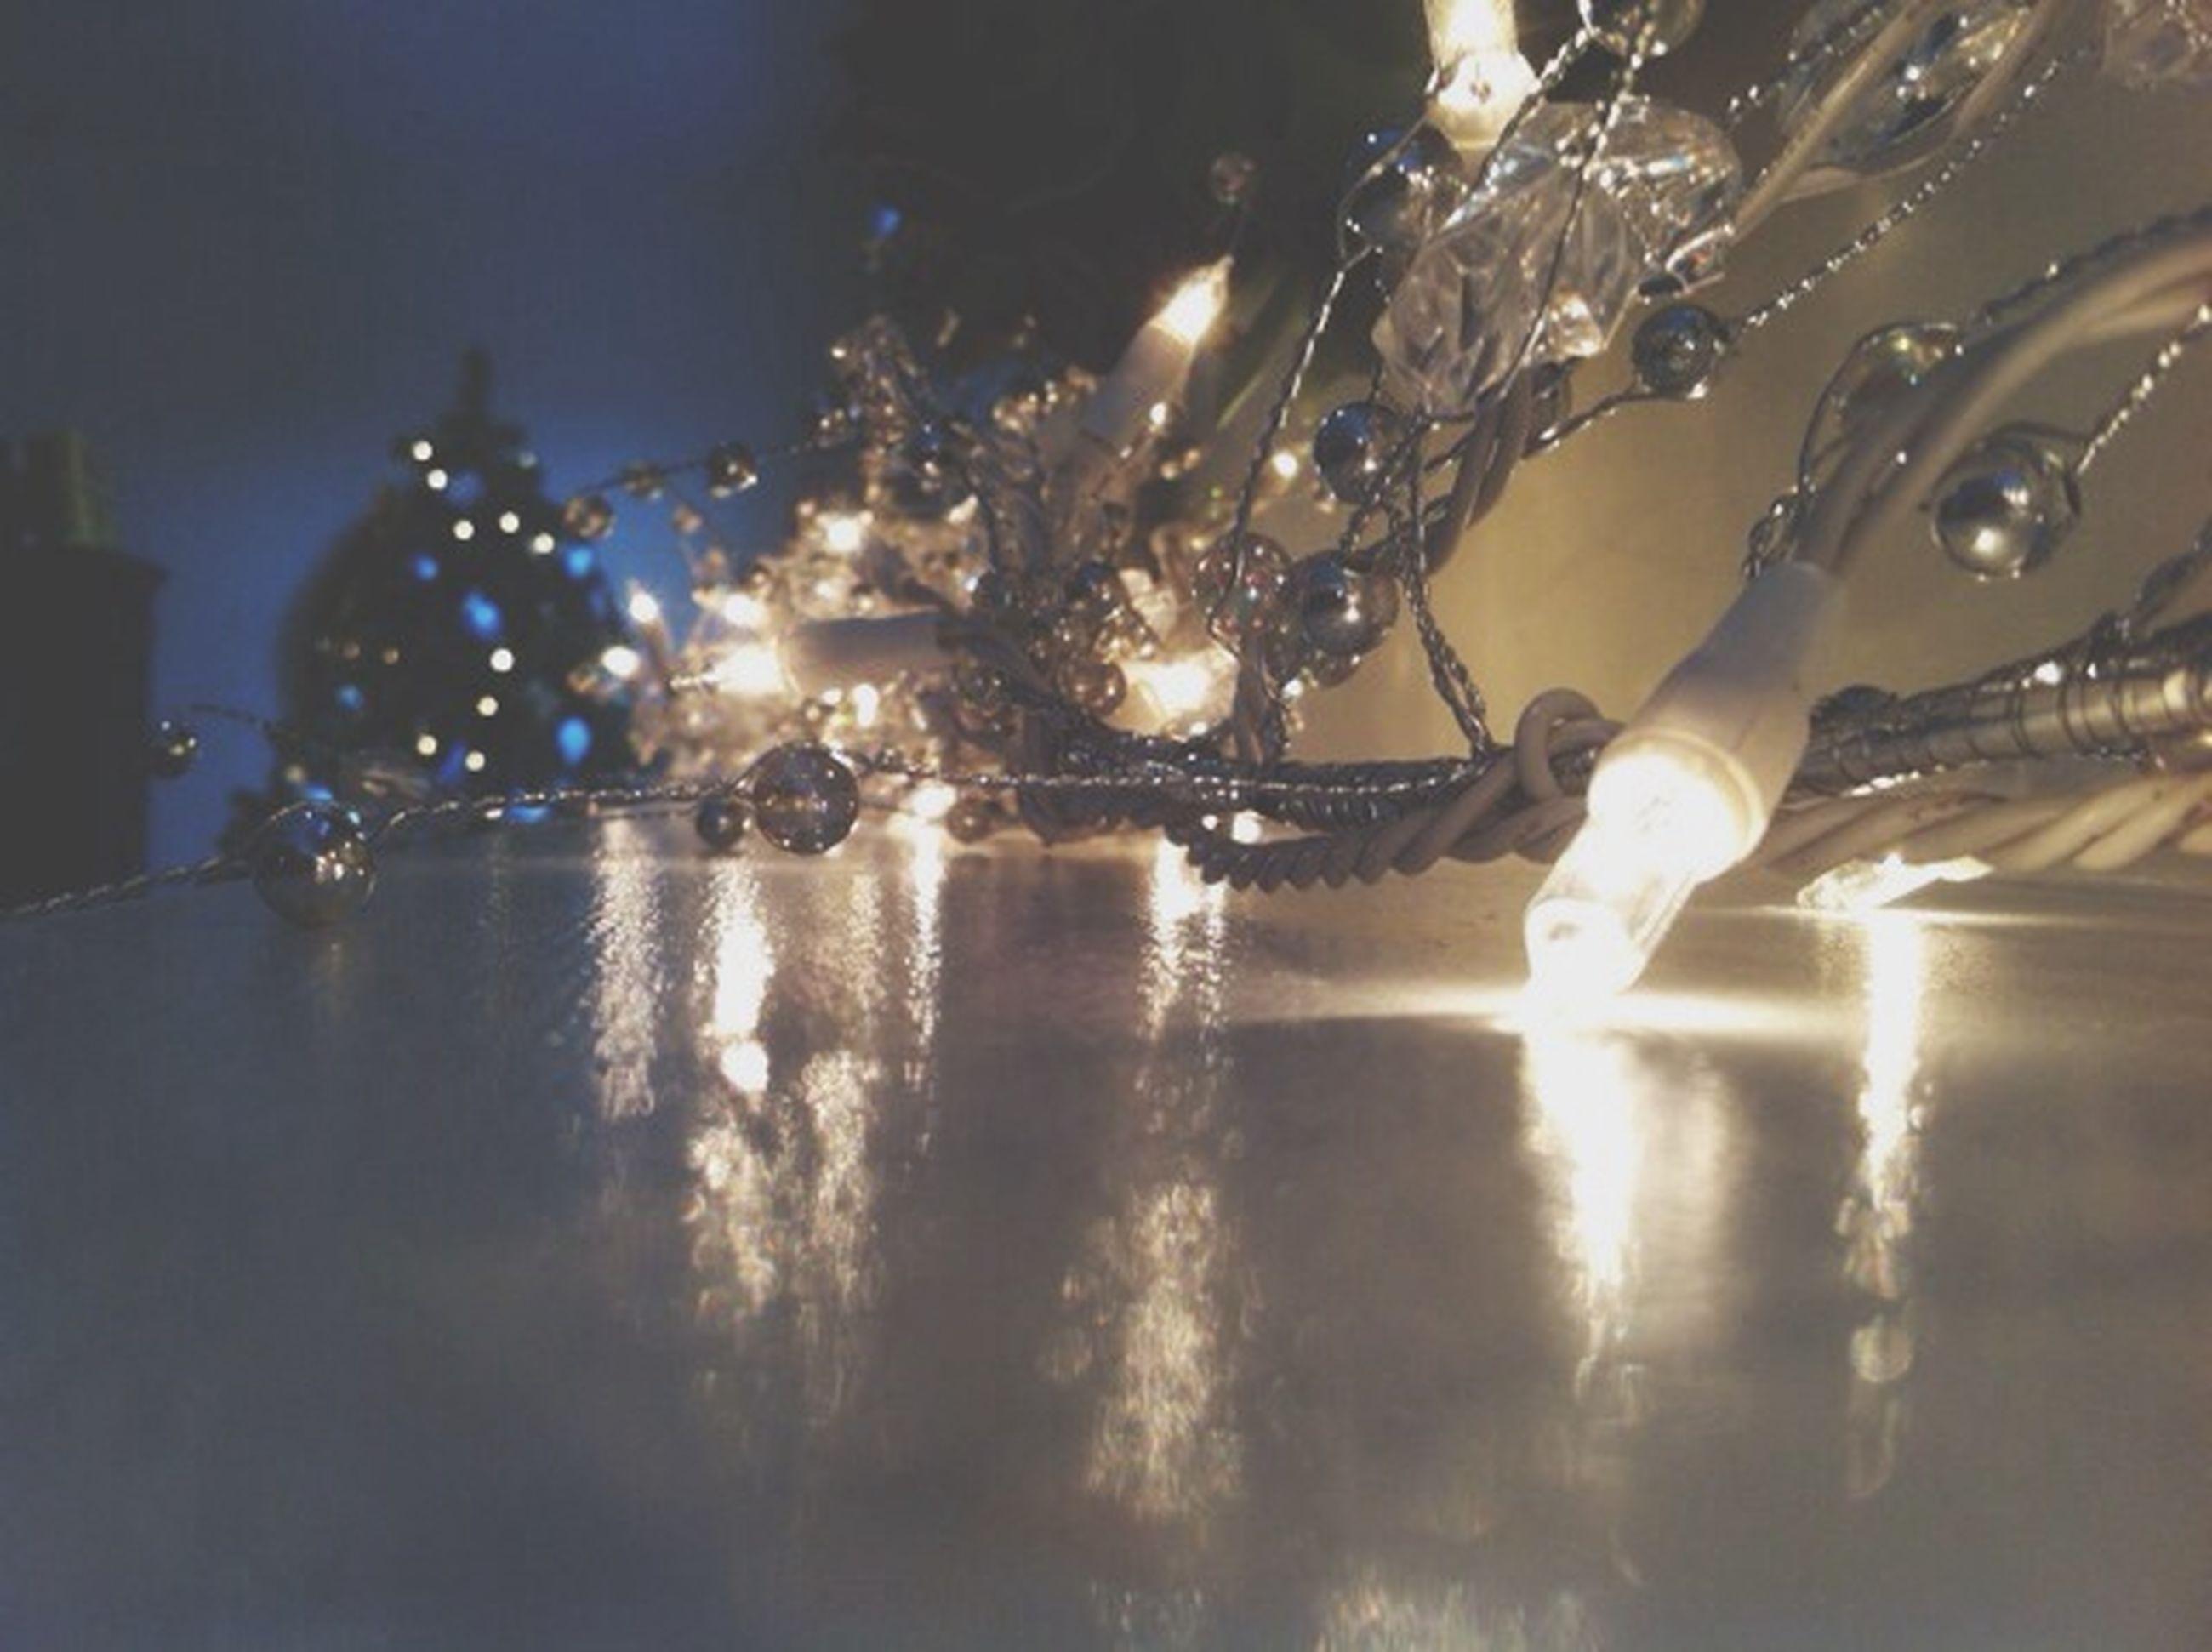 illuminated, night, water, reflection, transportation, street light, lighting equipment, mode of transport, motion, long exposure, street, waterfront, city, outdoors, land vehicle, sky, car, wet, light - natural phenomenon, glowing